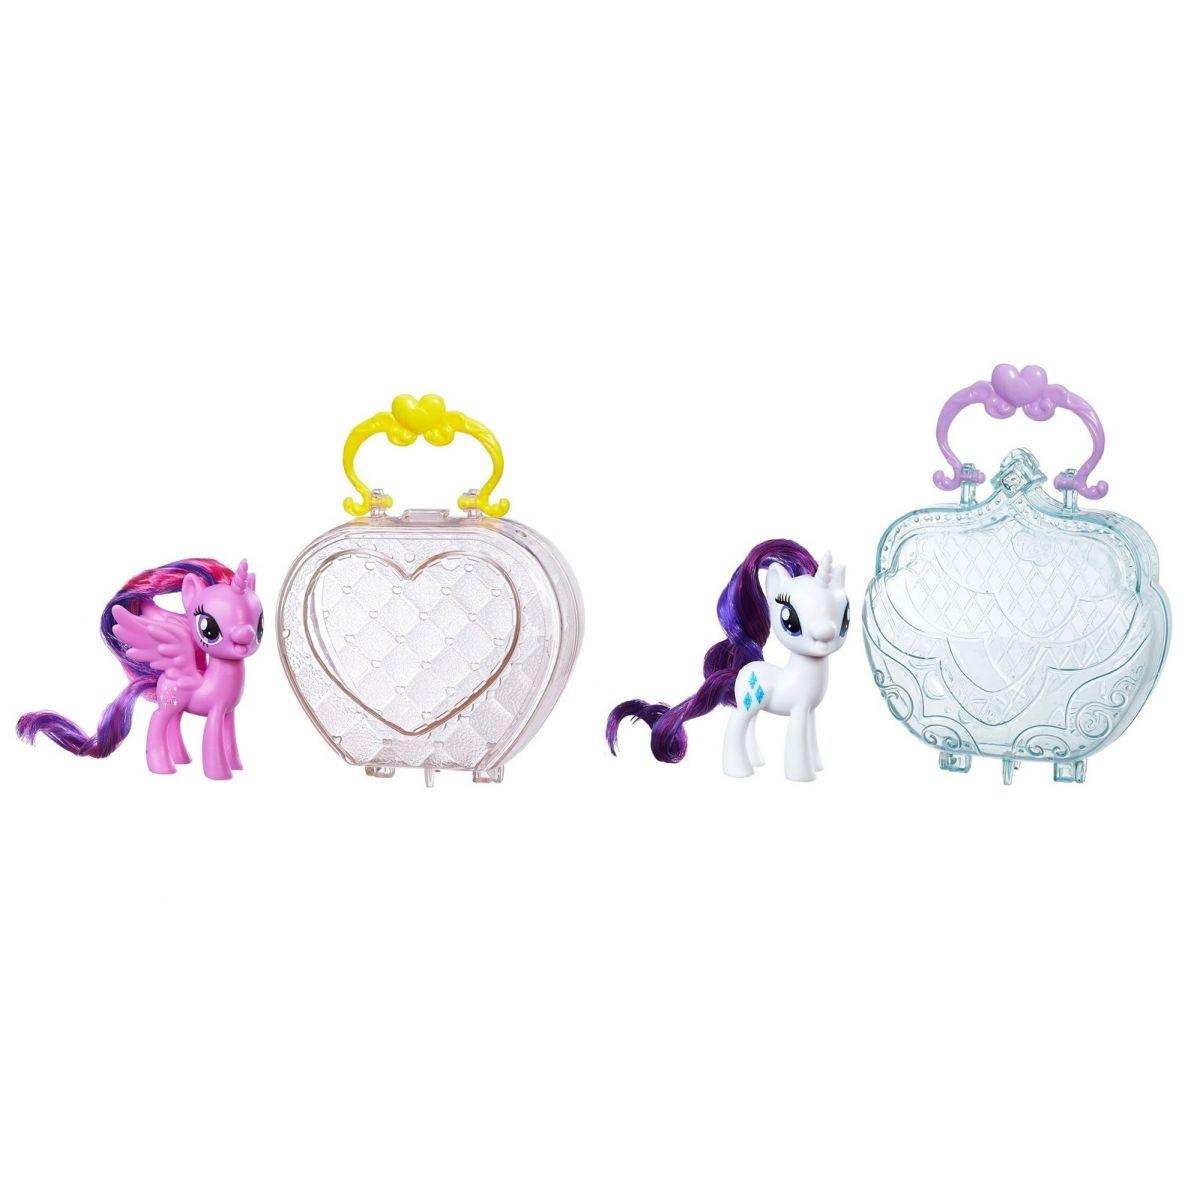 My Little Pony Bolsinha de Passeio - Rarity/ Twilight Sparkle - Hasbro